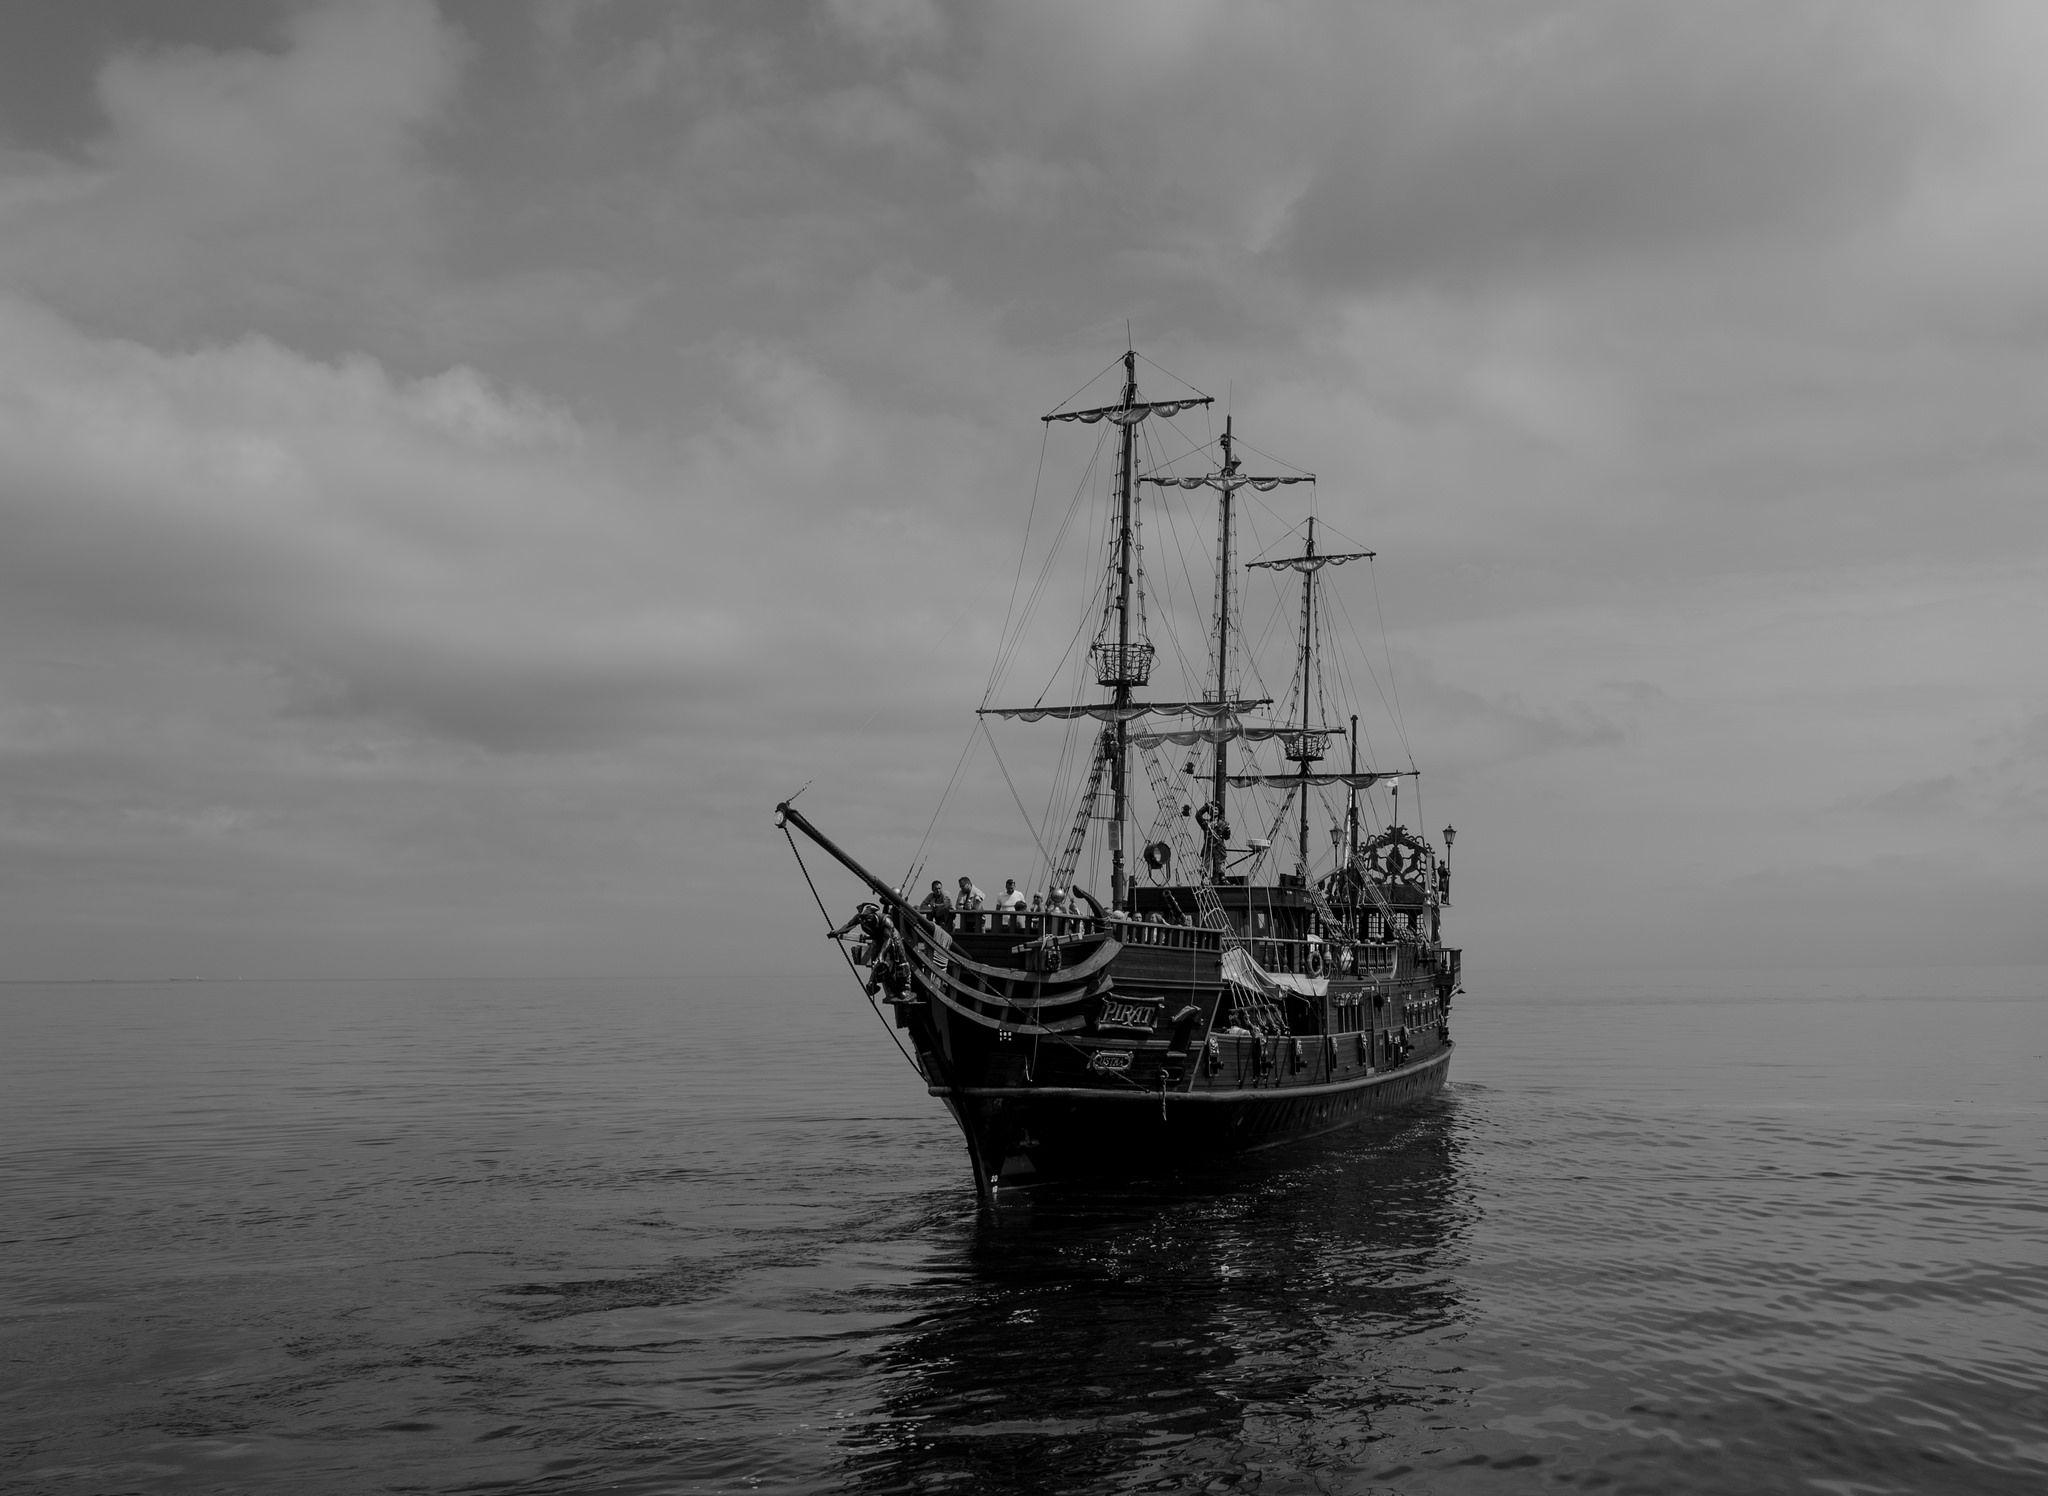 https://flic.kr/p/nAMvEh | Pirates and tourists